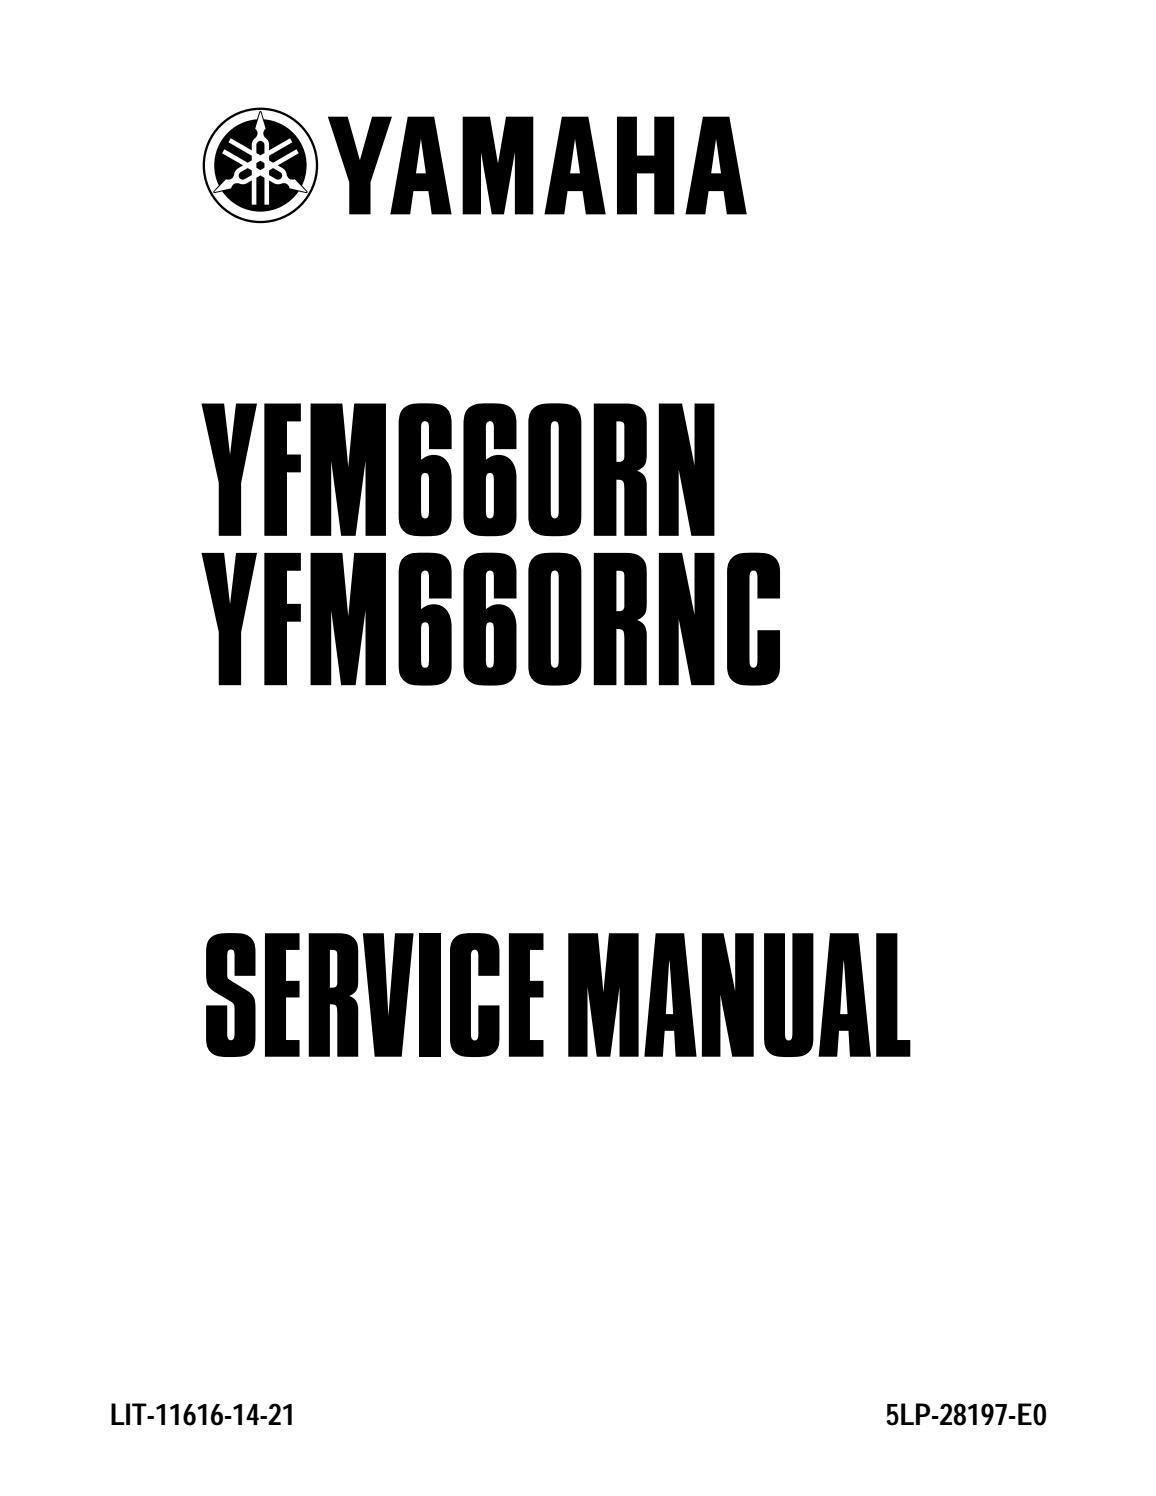 2001 YAMAHA YFM660 RAPTOR Service Repair Manual by 163615